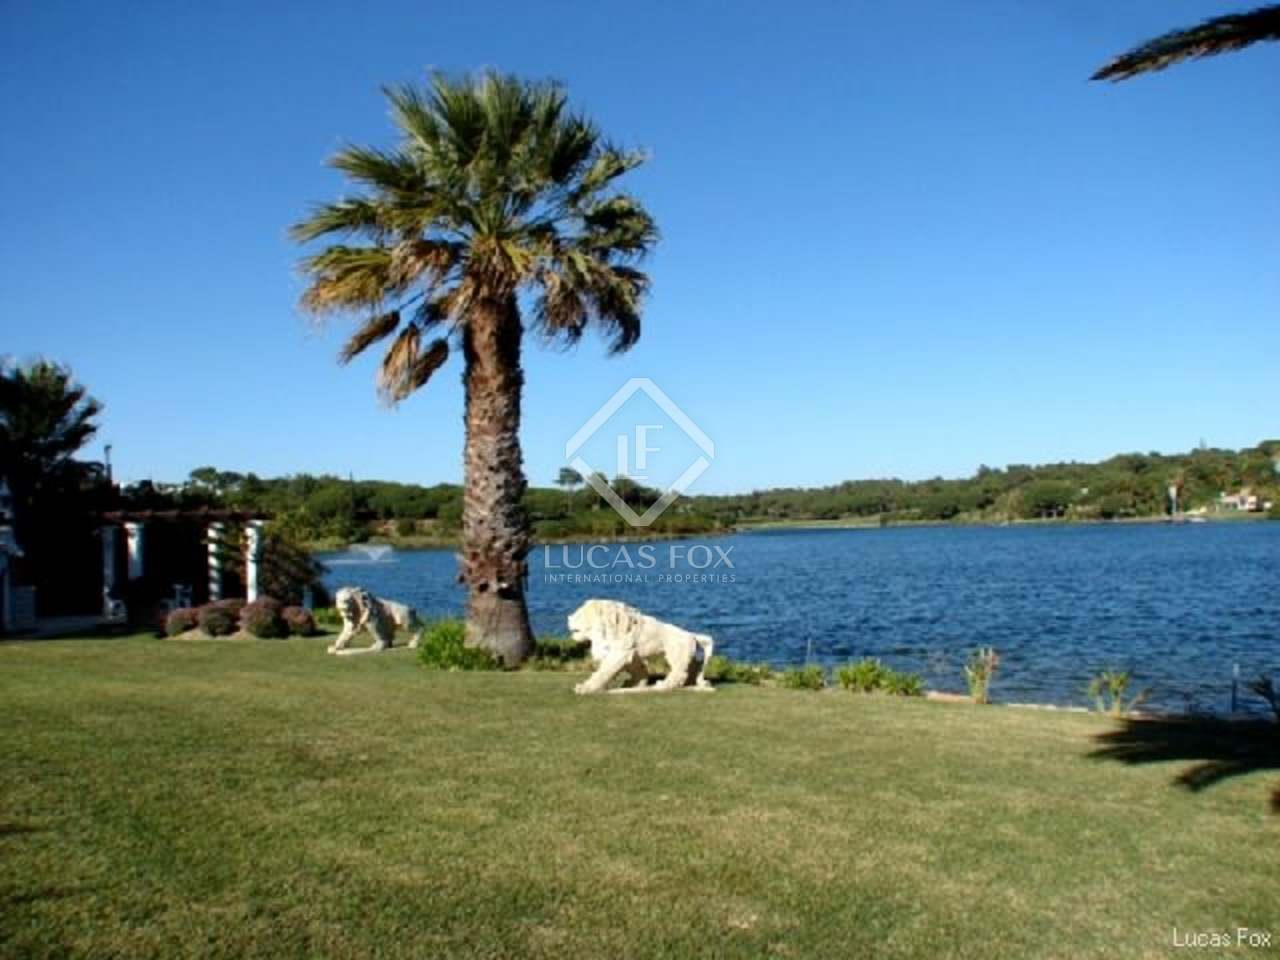 660m haus villa zum verkauf in algarve portugal. Black Bedroom Furniture Sets. Home Design Ideas